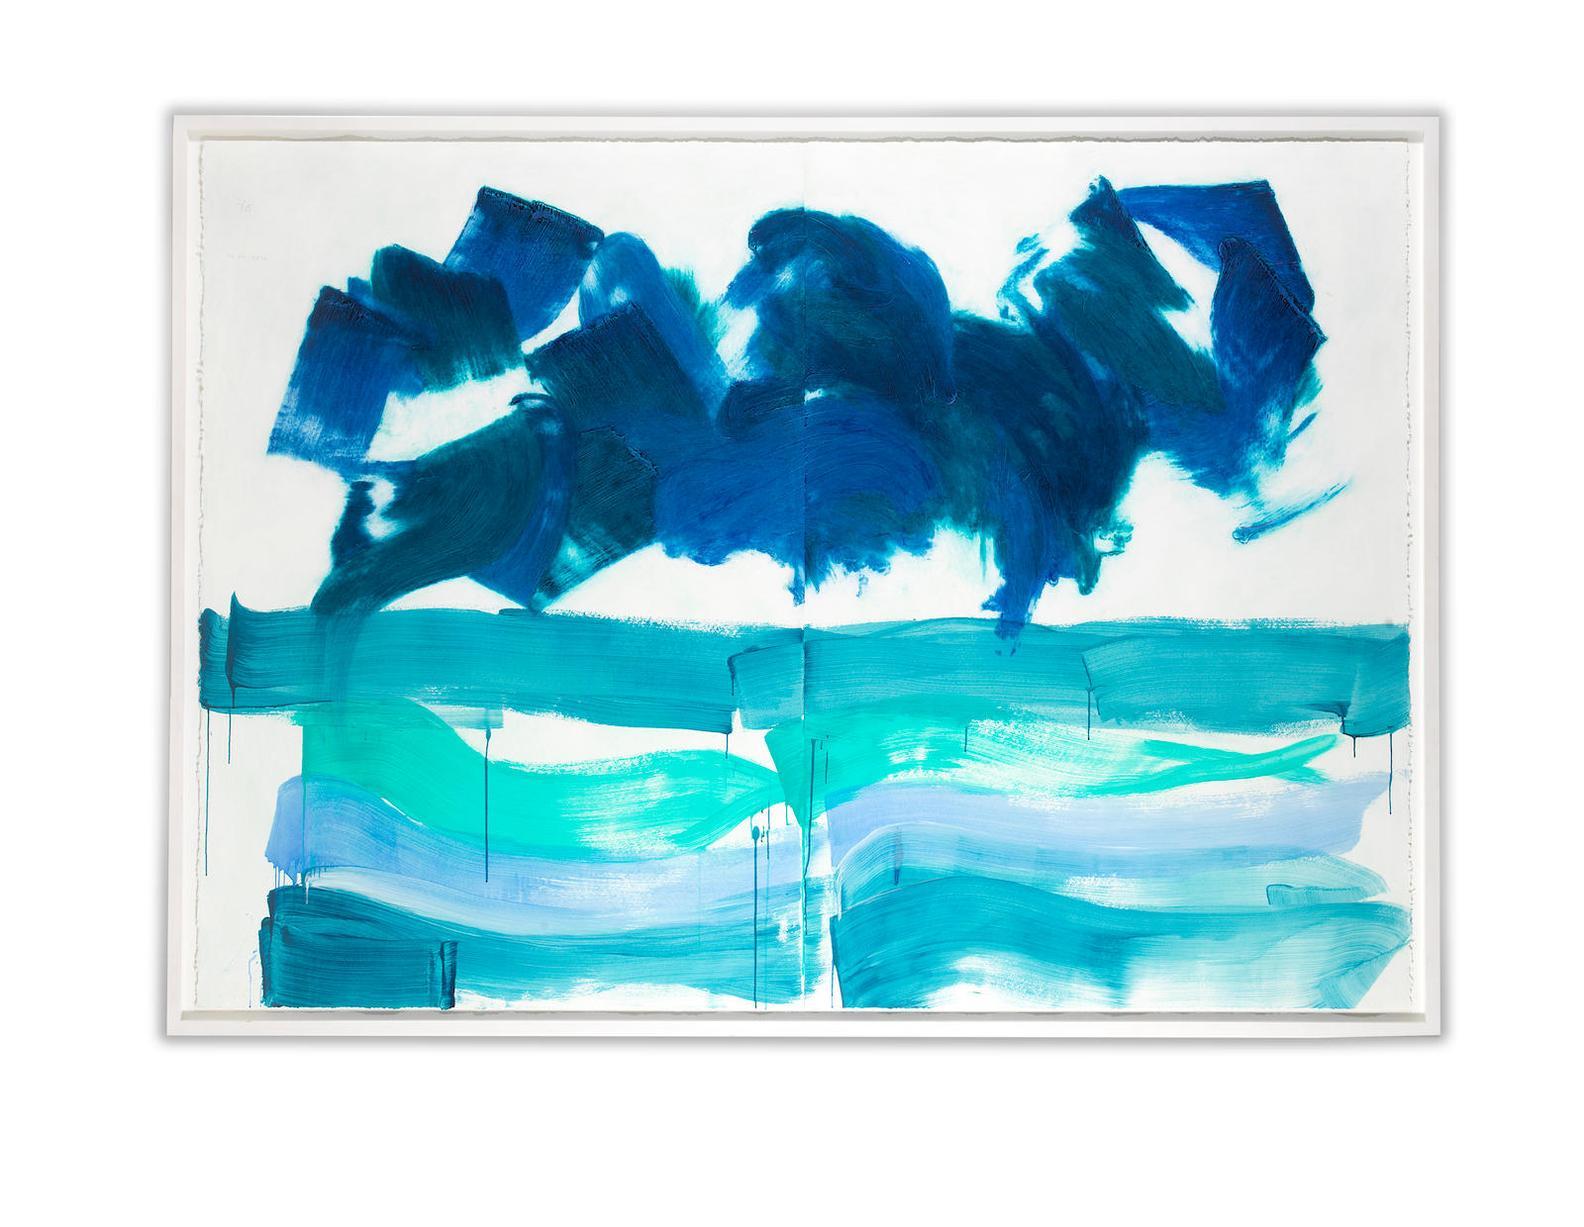 Howard Hodgkin-Stormy Weather-2012